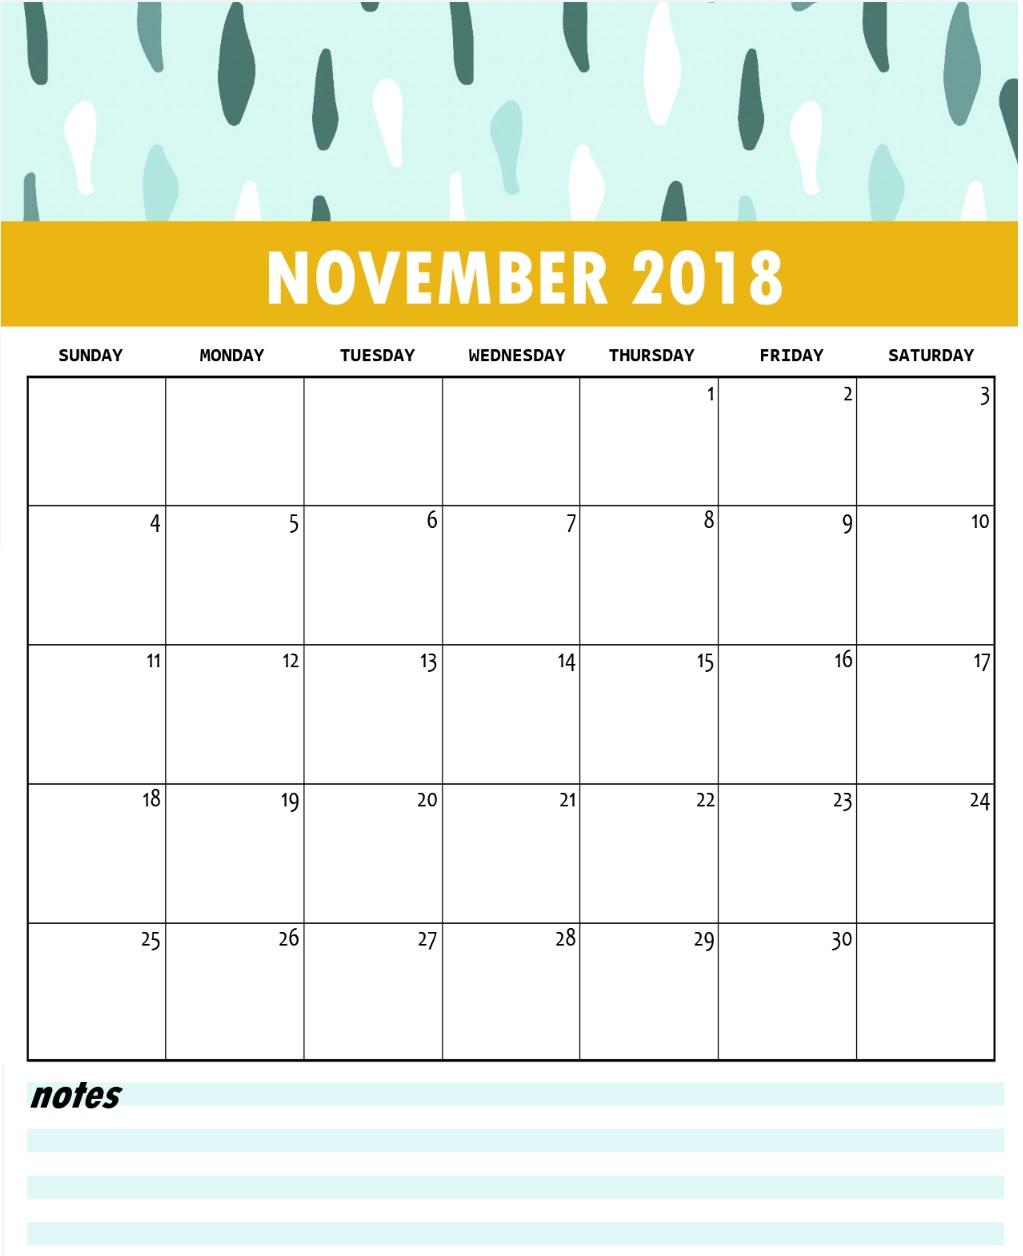 November Calendar 2018 Vertical - Free Printable Calendar